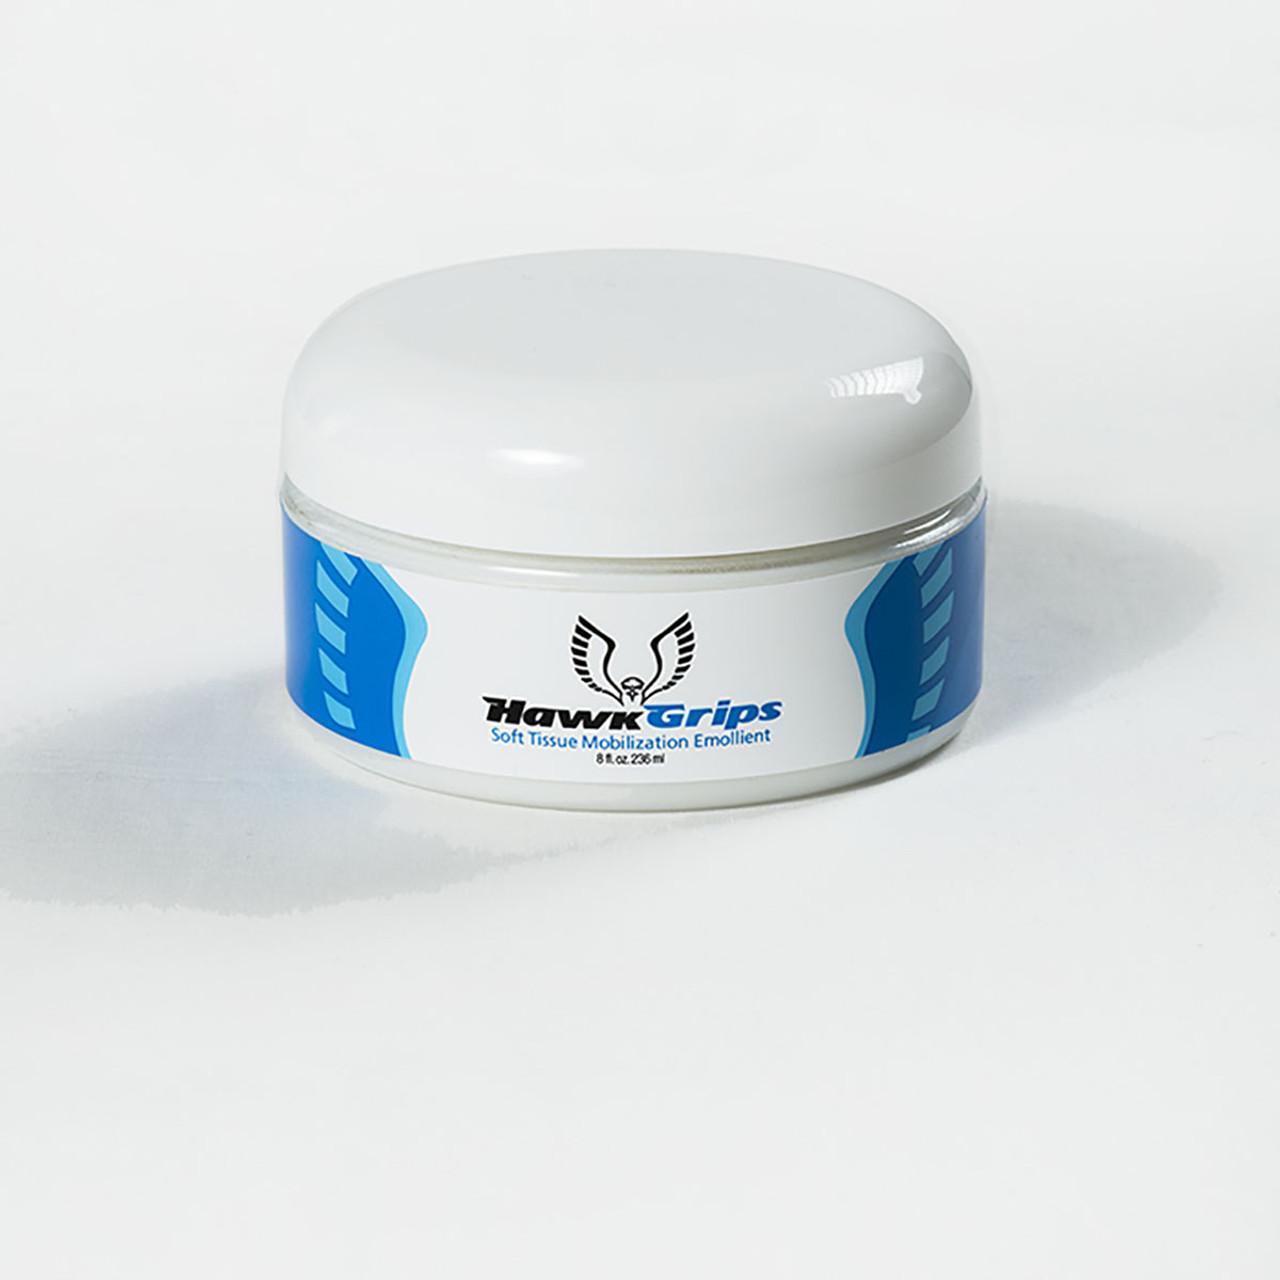 HawkGrips Fragrance Free Emollient, 20 jar pack